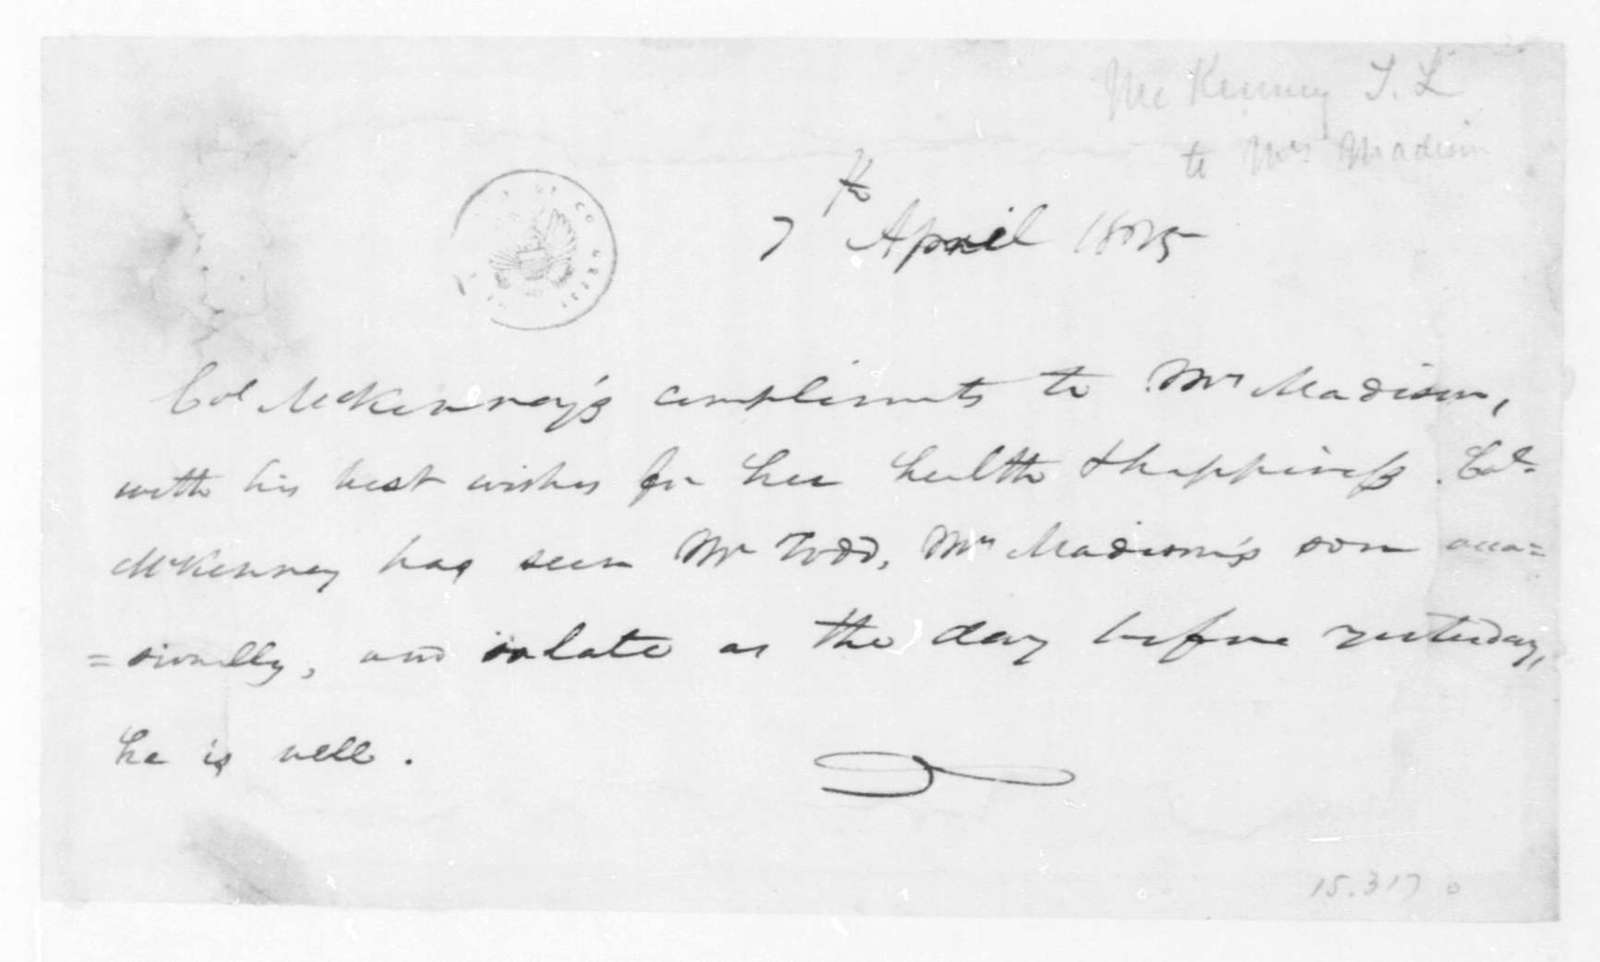 Thomas L. McKenney to Dolley Payne Madison, April 7, 1825.